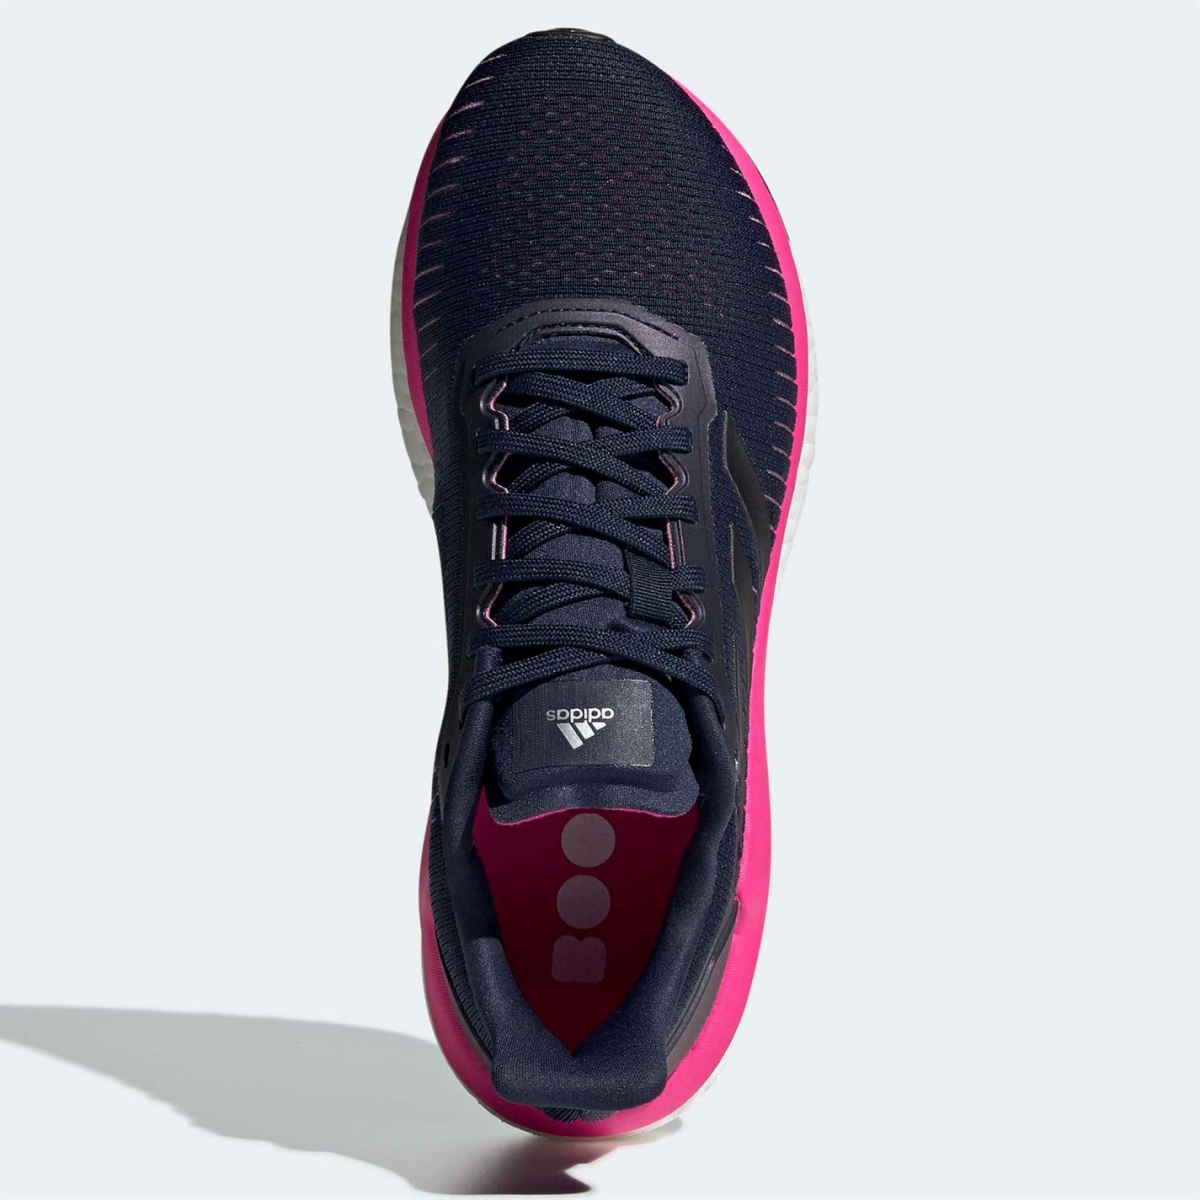 adidas-Solar-Drive-Laufschuhe-Damen-Sportschuhe-Turnschuhe-Jogging-4095 Indexbild 8